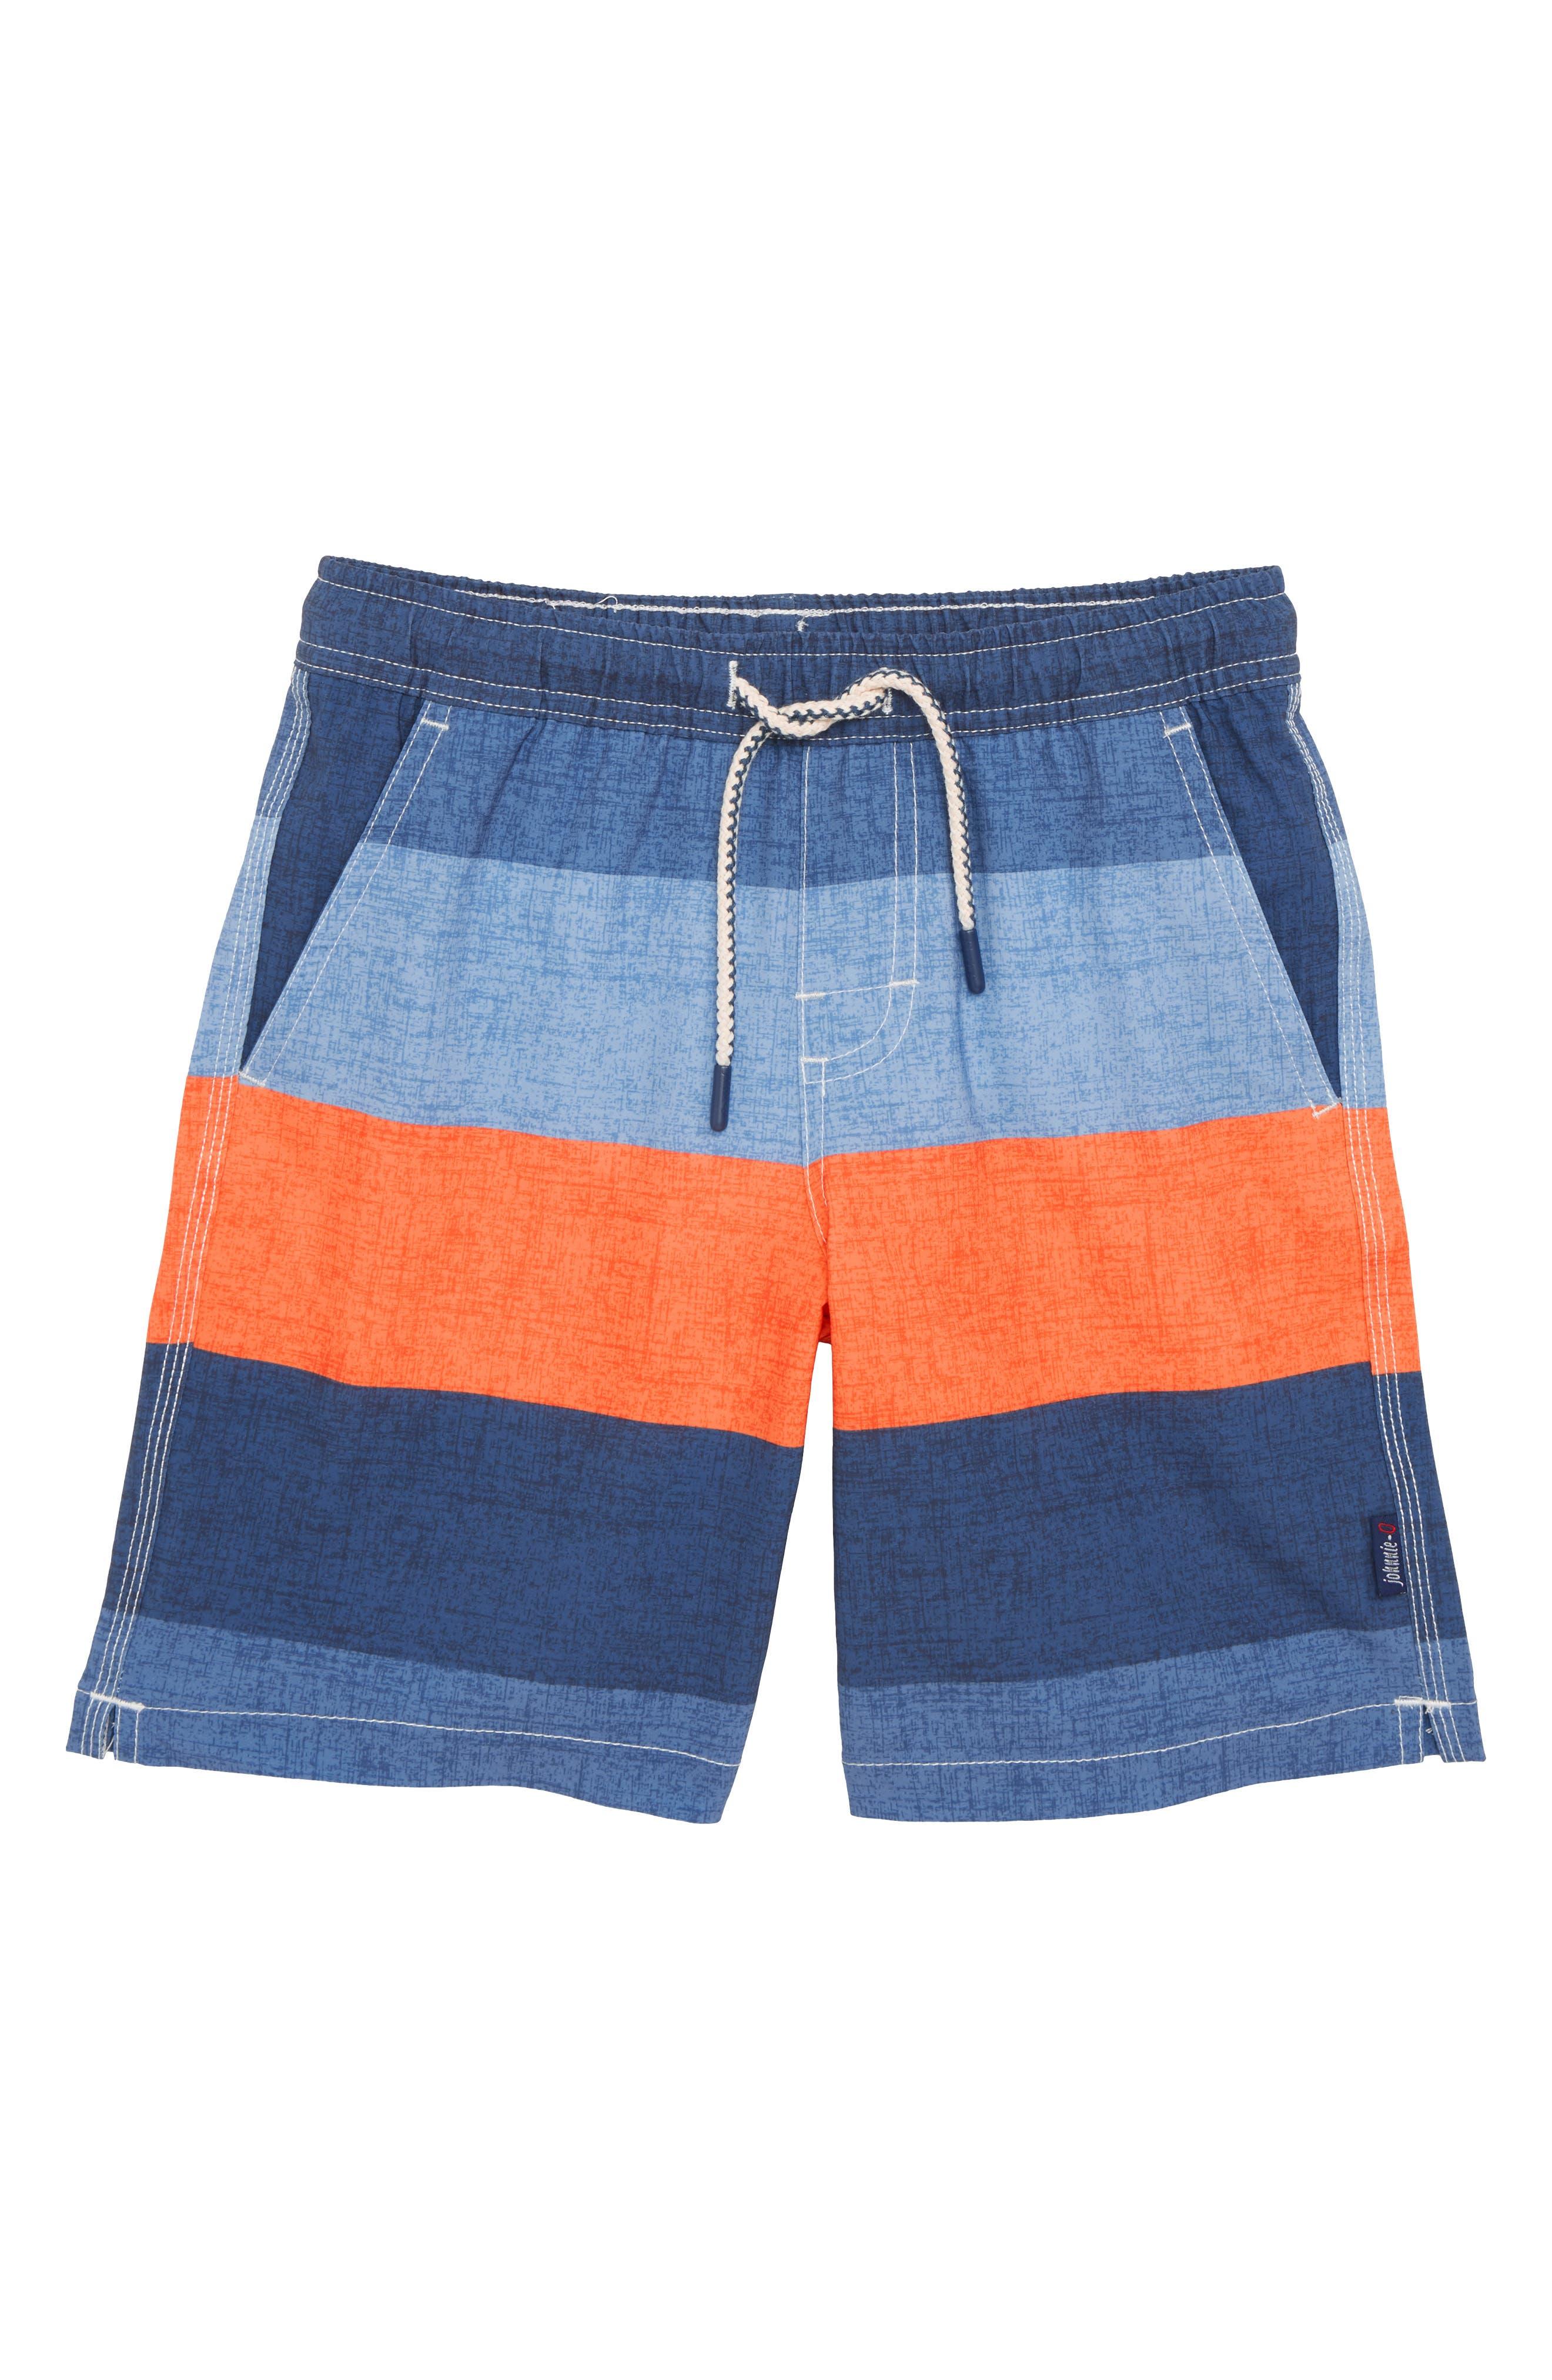 Shore Swim Trunks,                         Main,                         color, 400